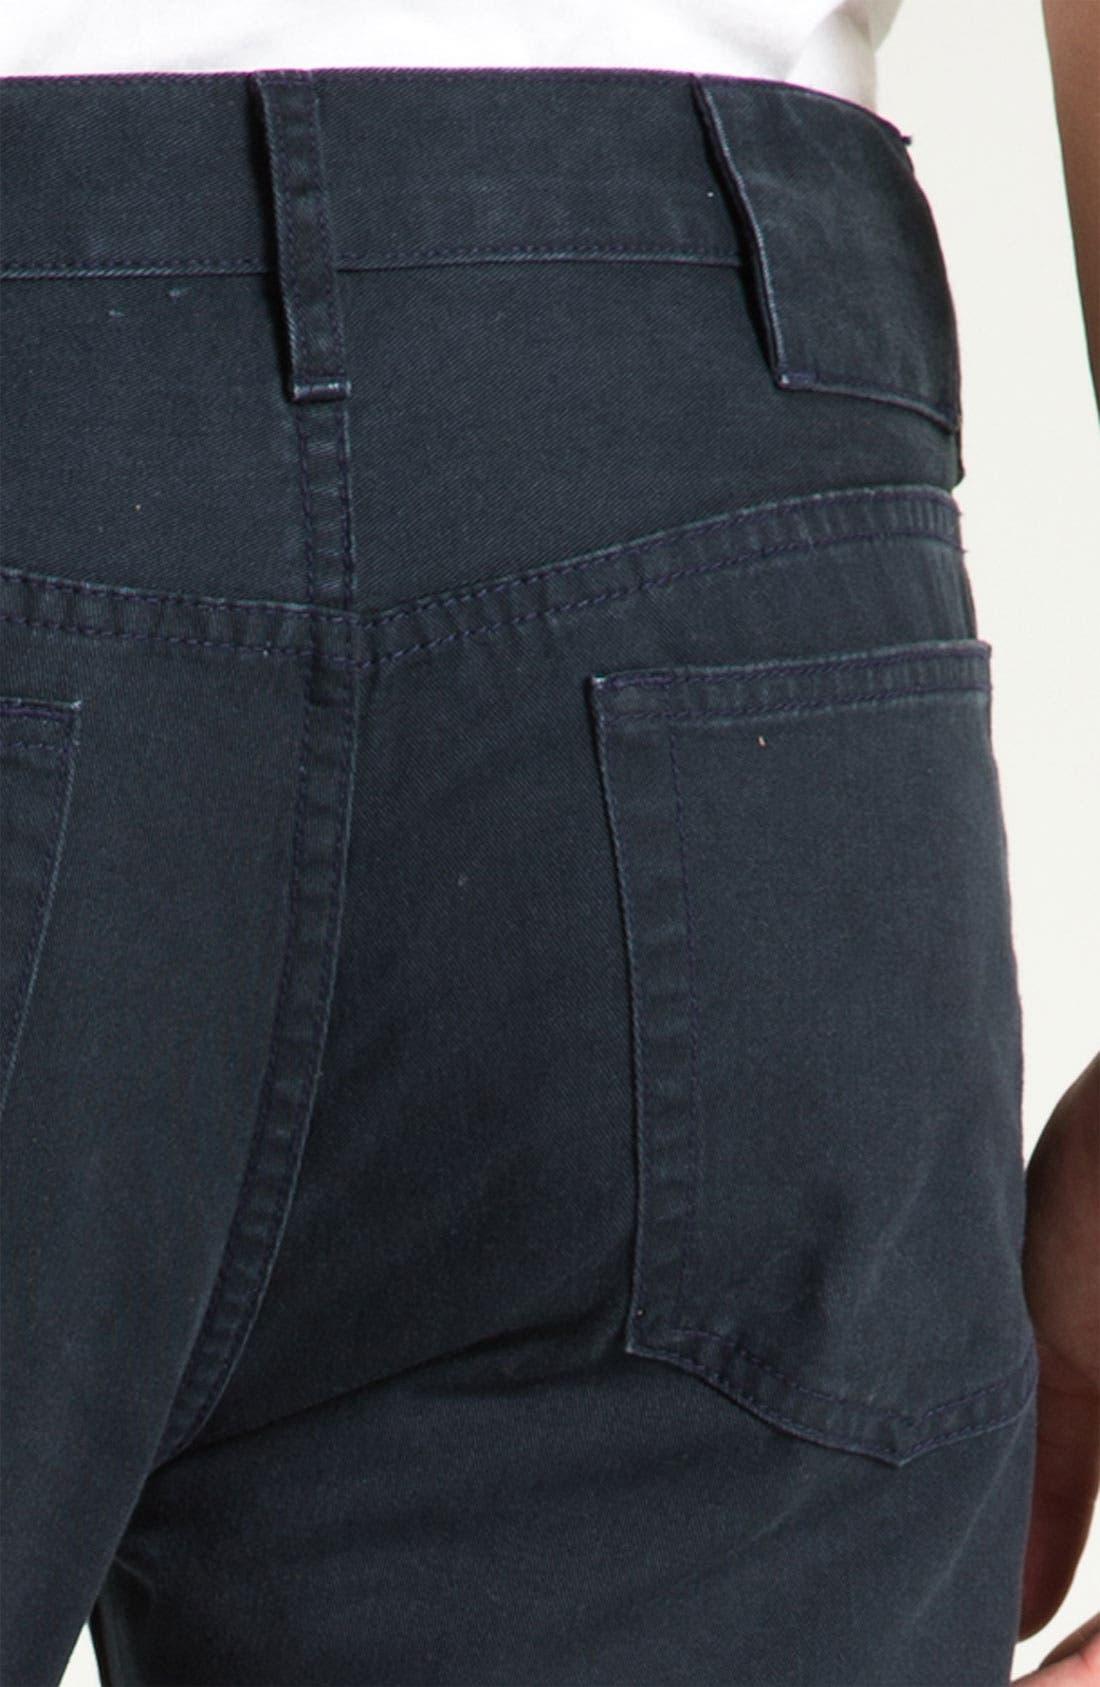 Alternate Image 3  - MARC BY MARC JACOBS Slim Straight Leg Jeans (Darkest Teal)